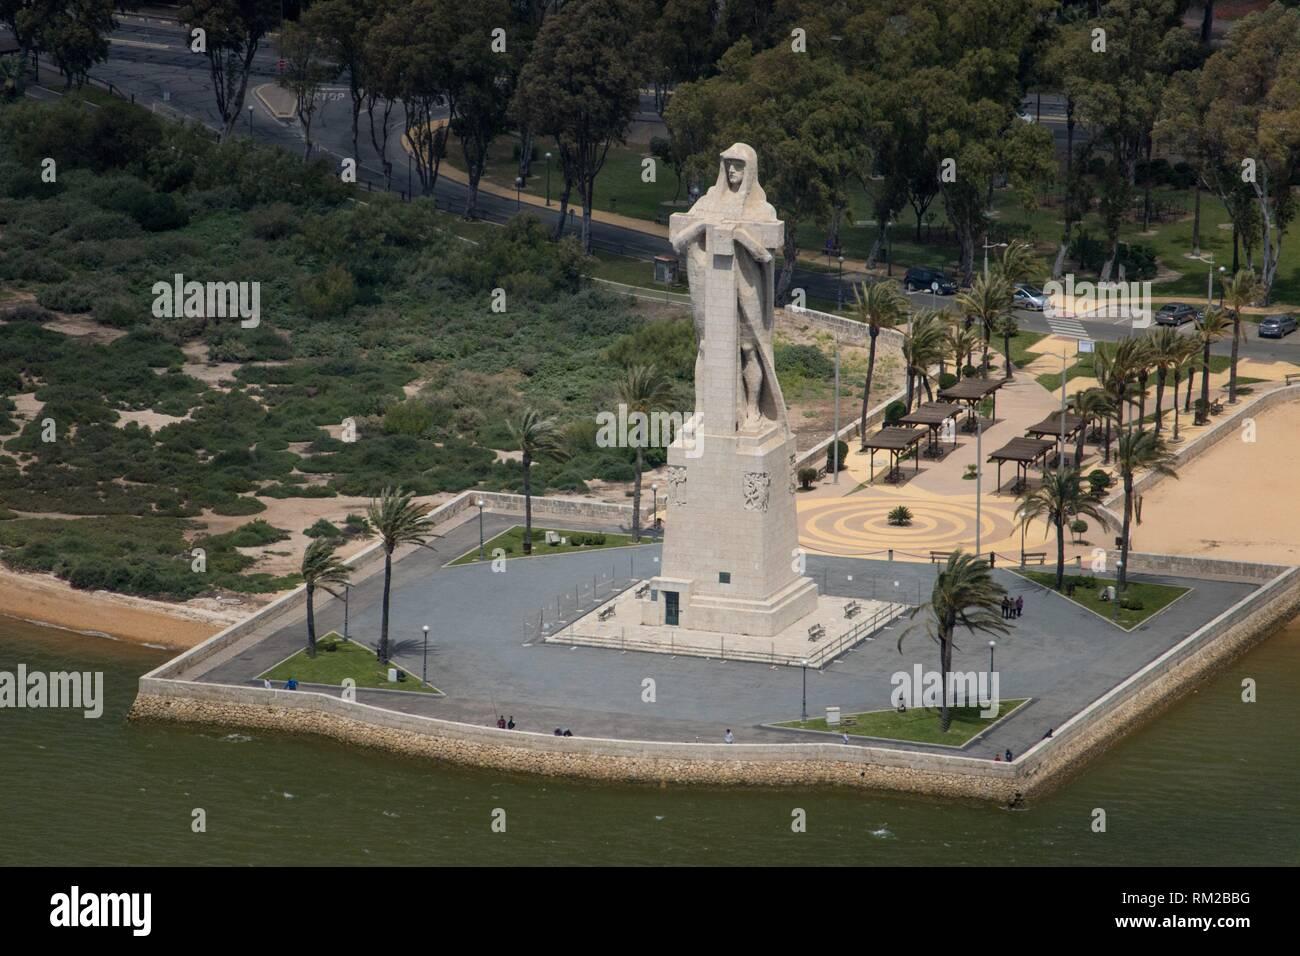 Monumento a la Fe Descubridora (Columbus monument), Huelva, Spain - Aerial - Stock Image